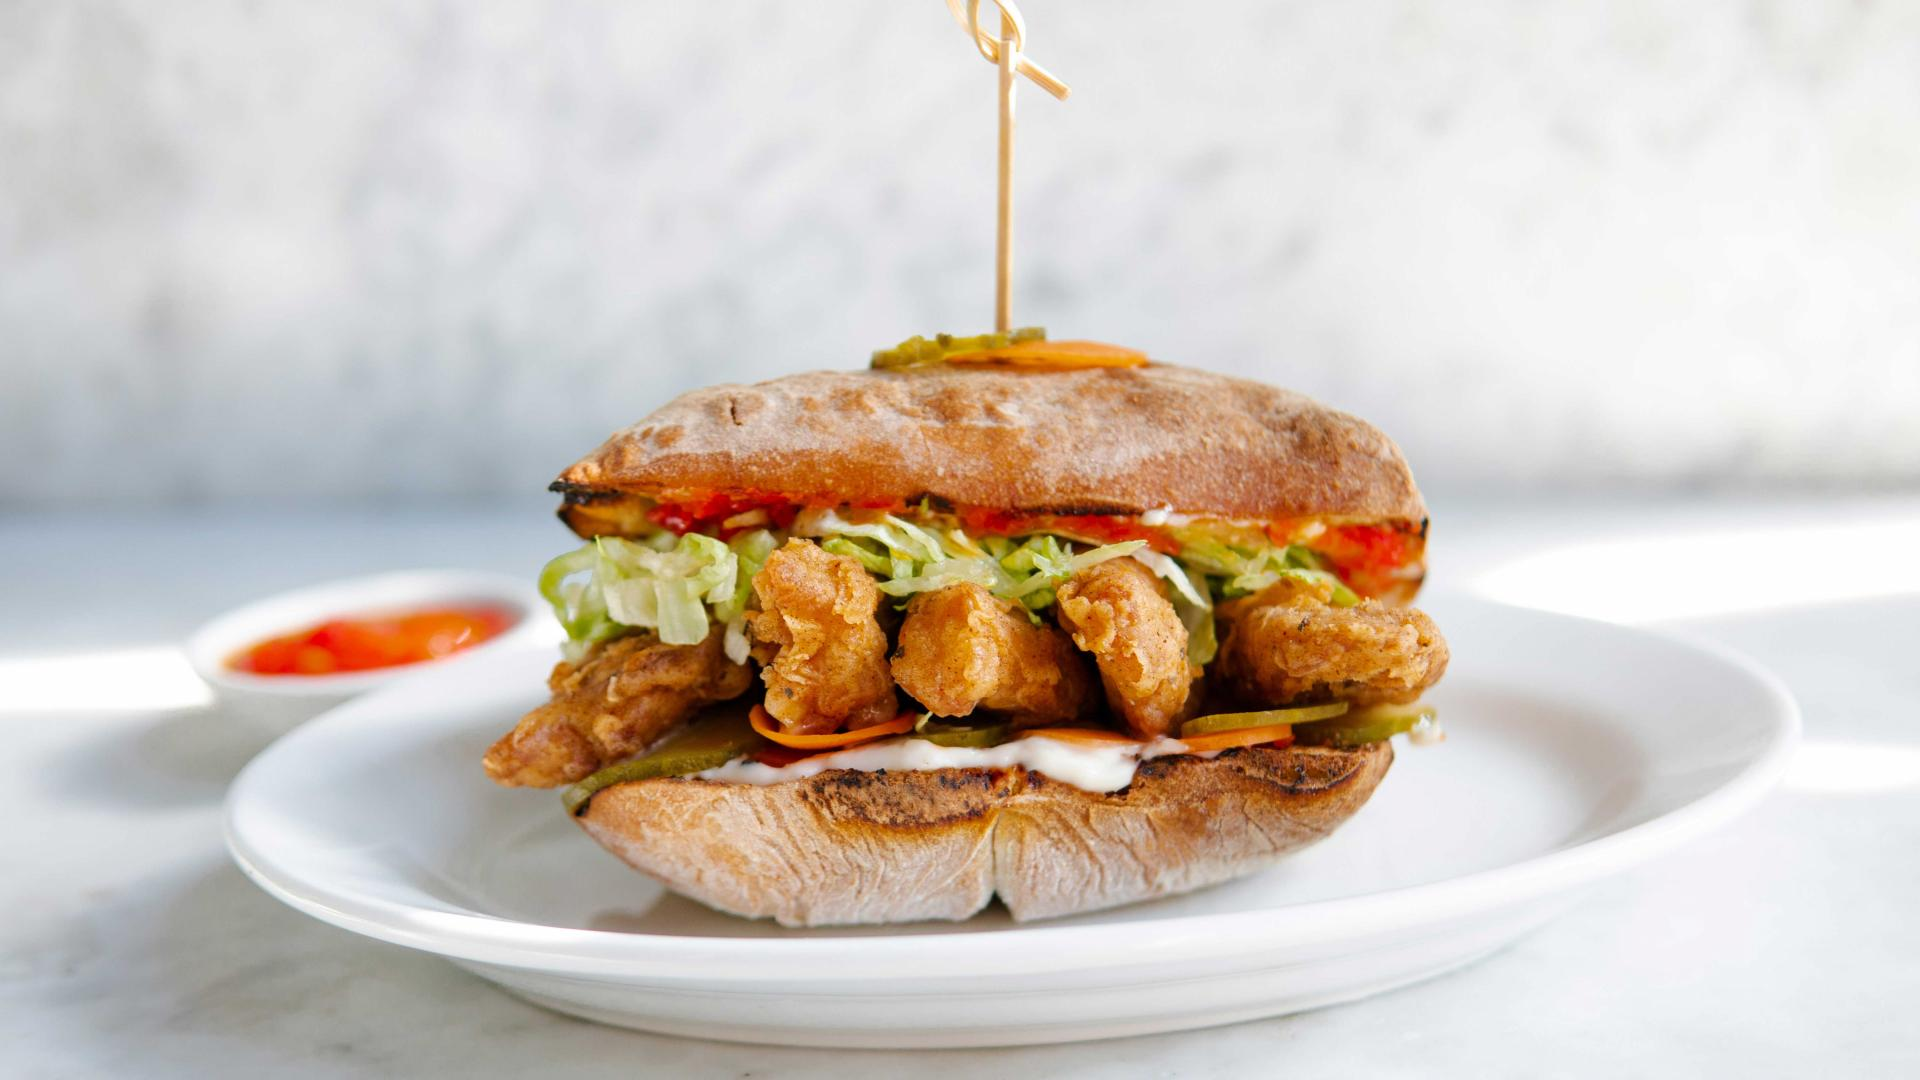 The best vegan restaurants in Toronto | Stefano's Sandwiches